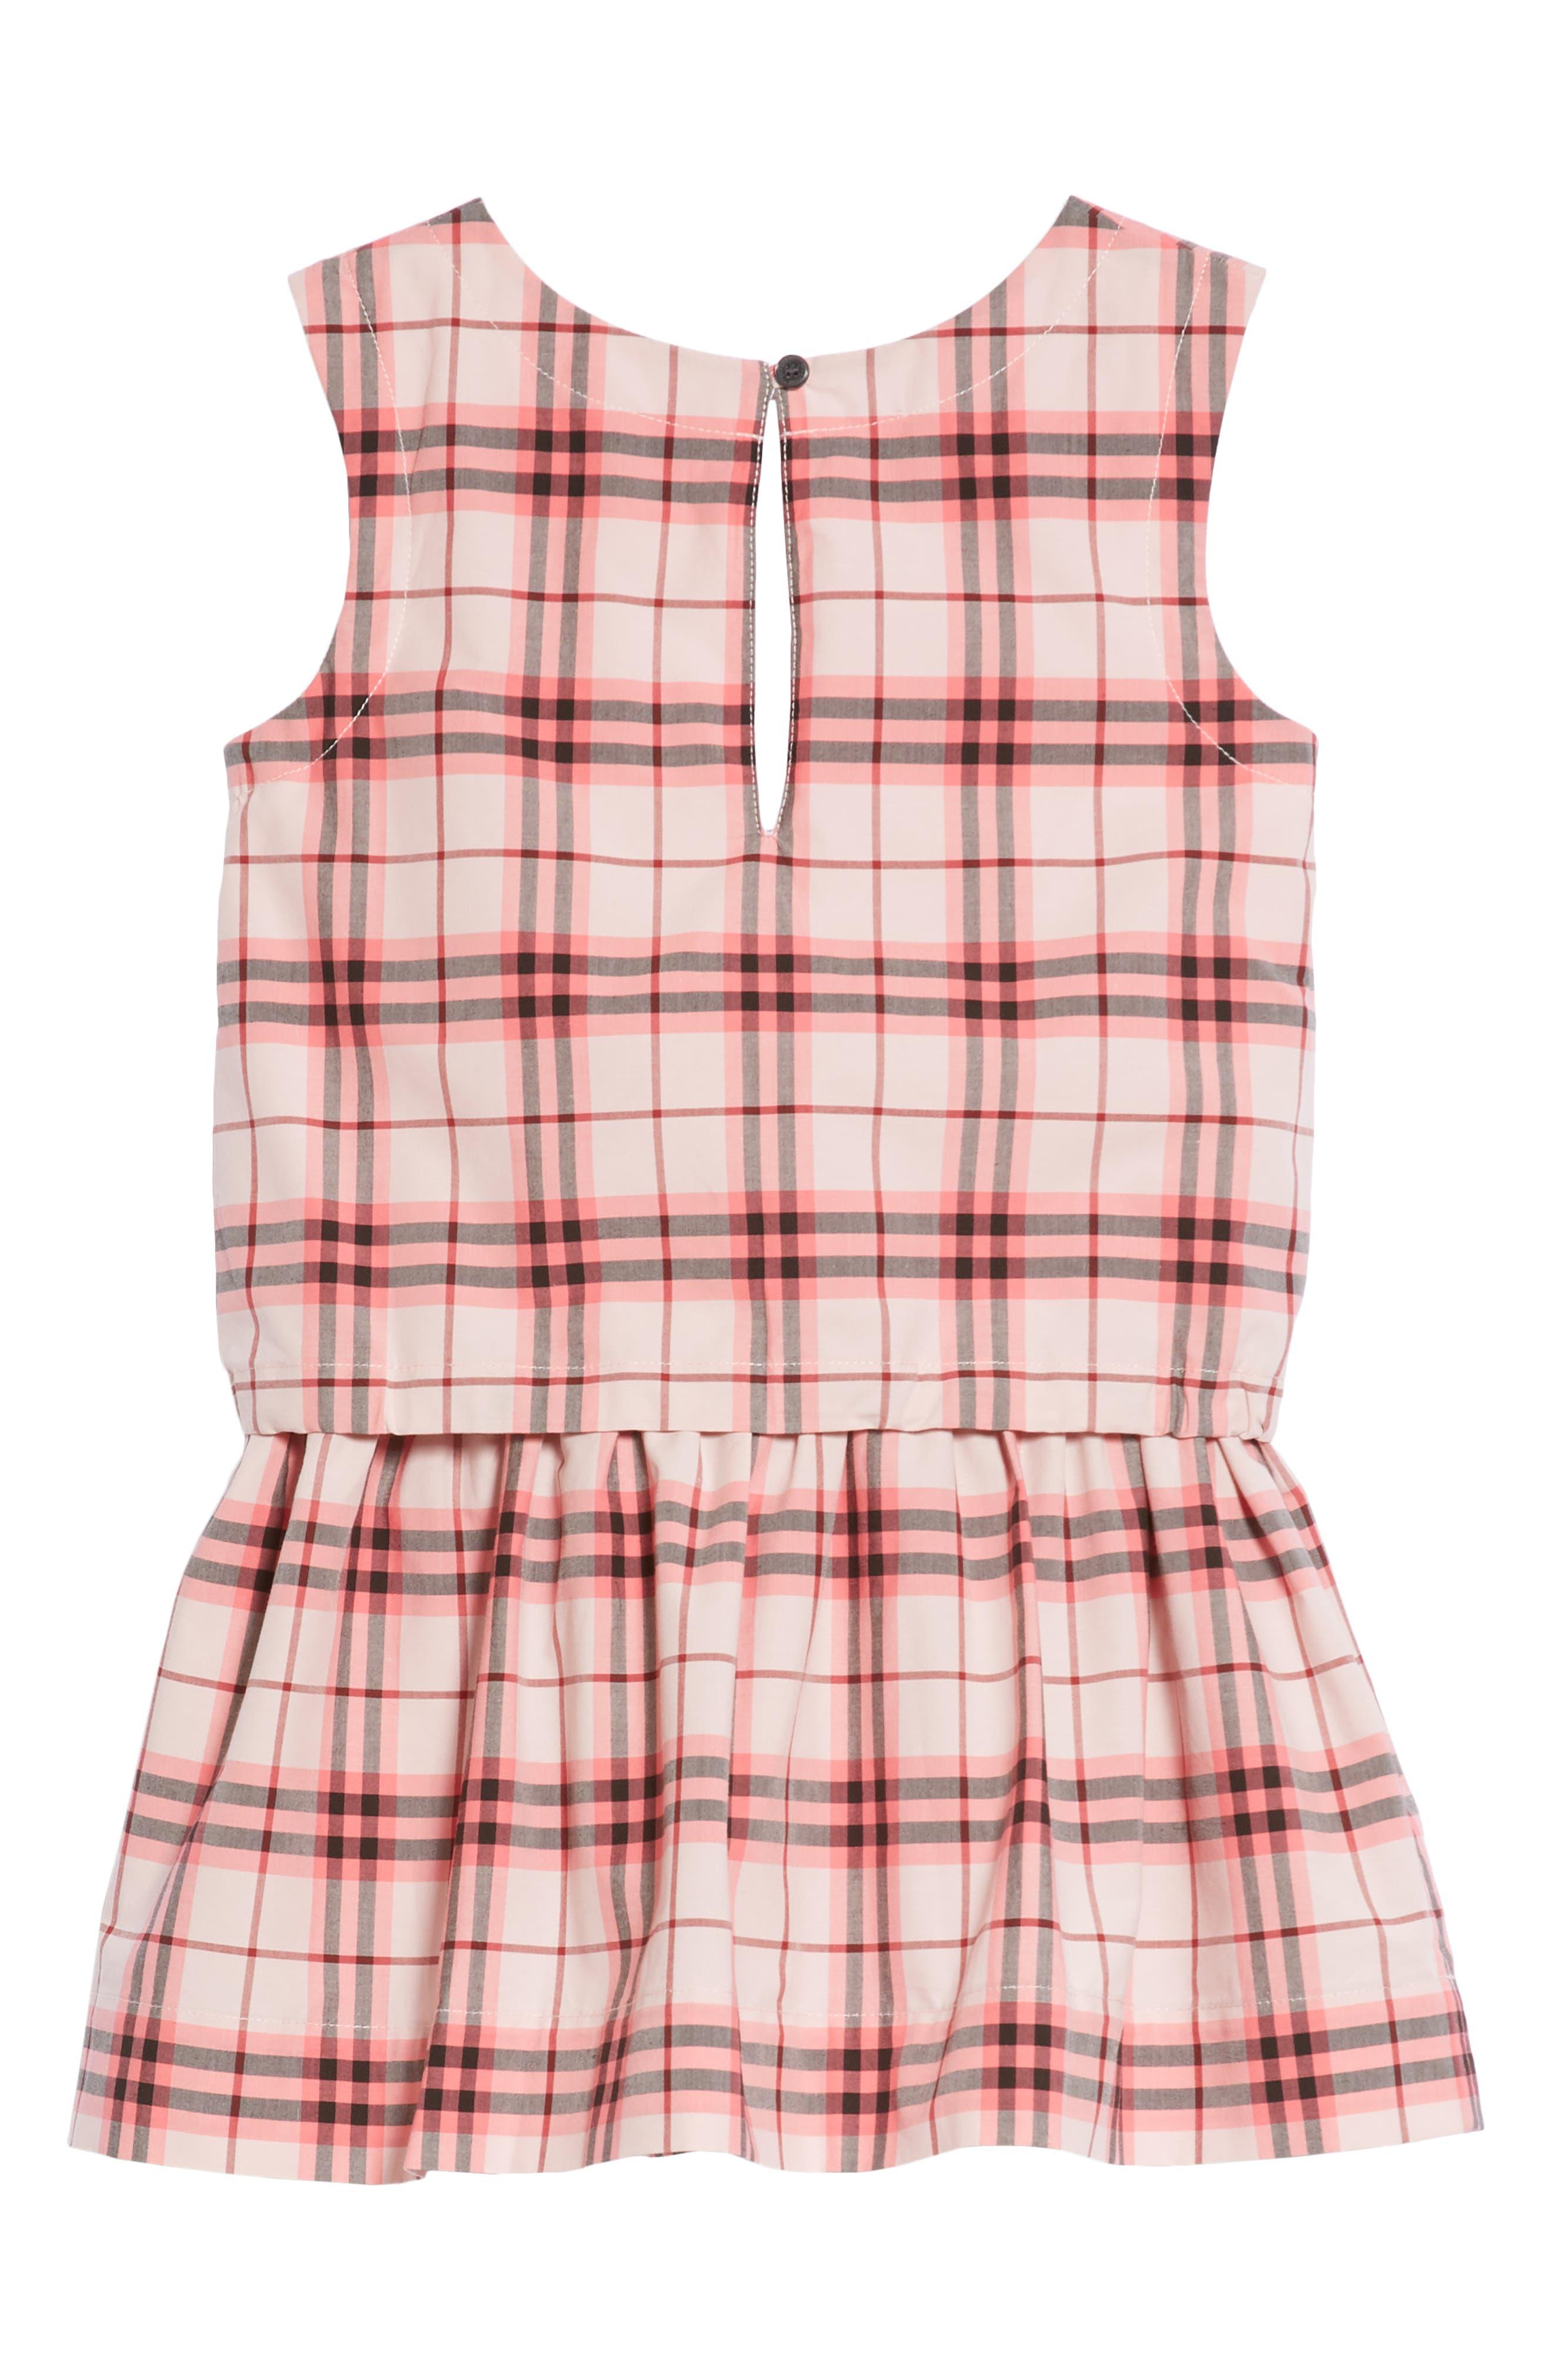 Mabel Check Dress,                             Alternate thumbnail 2, color,                             Bright Rose